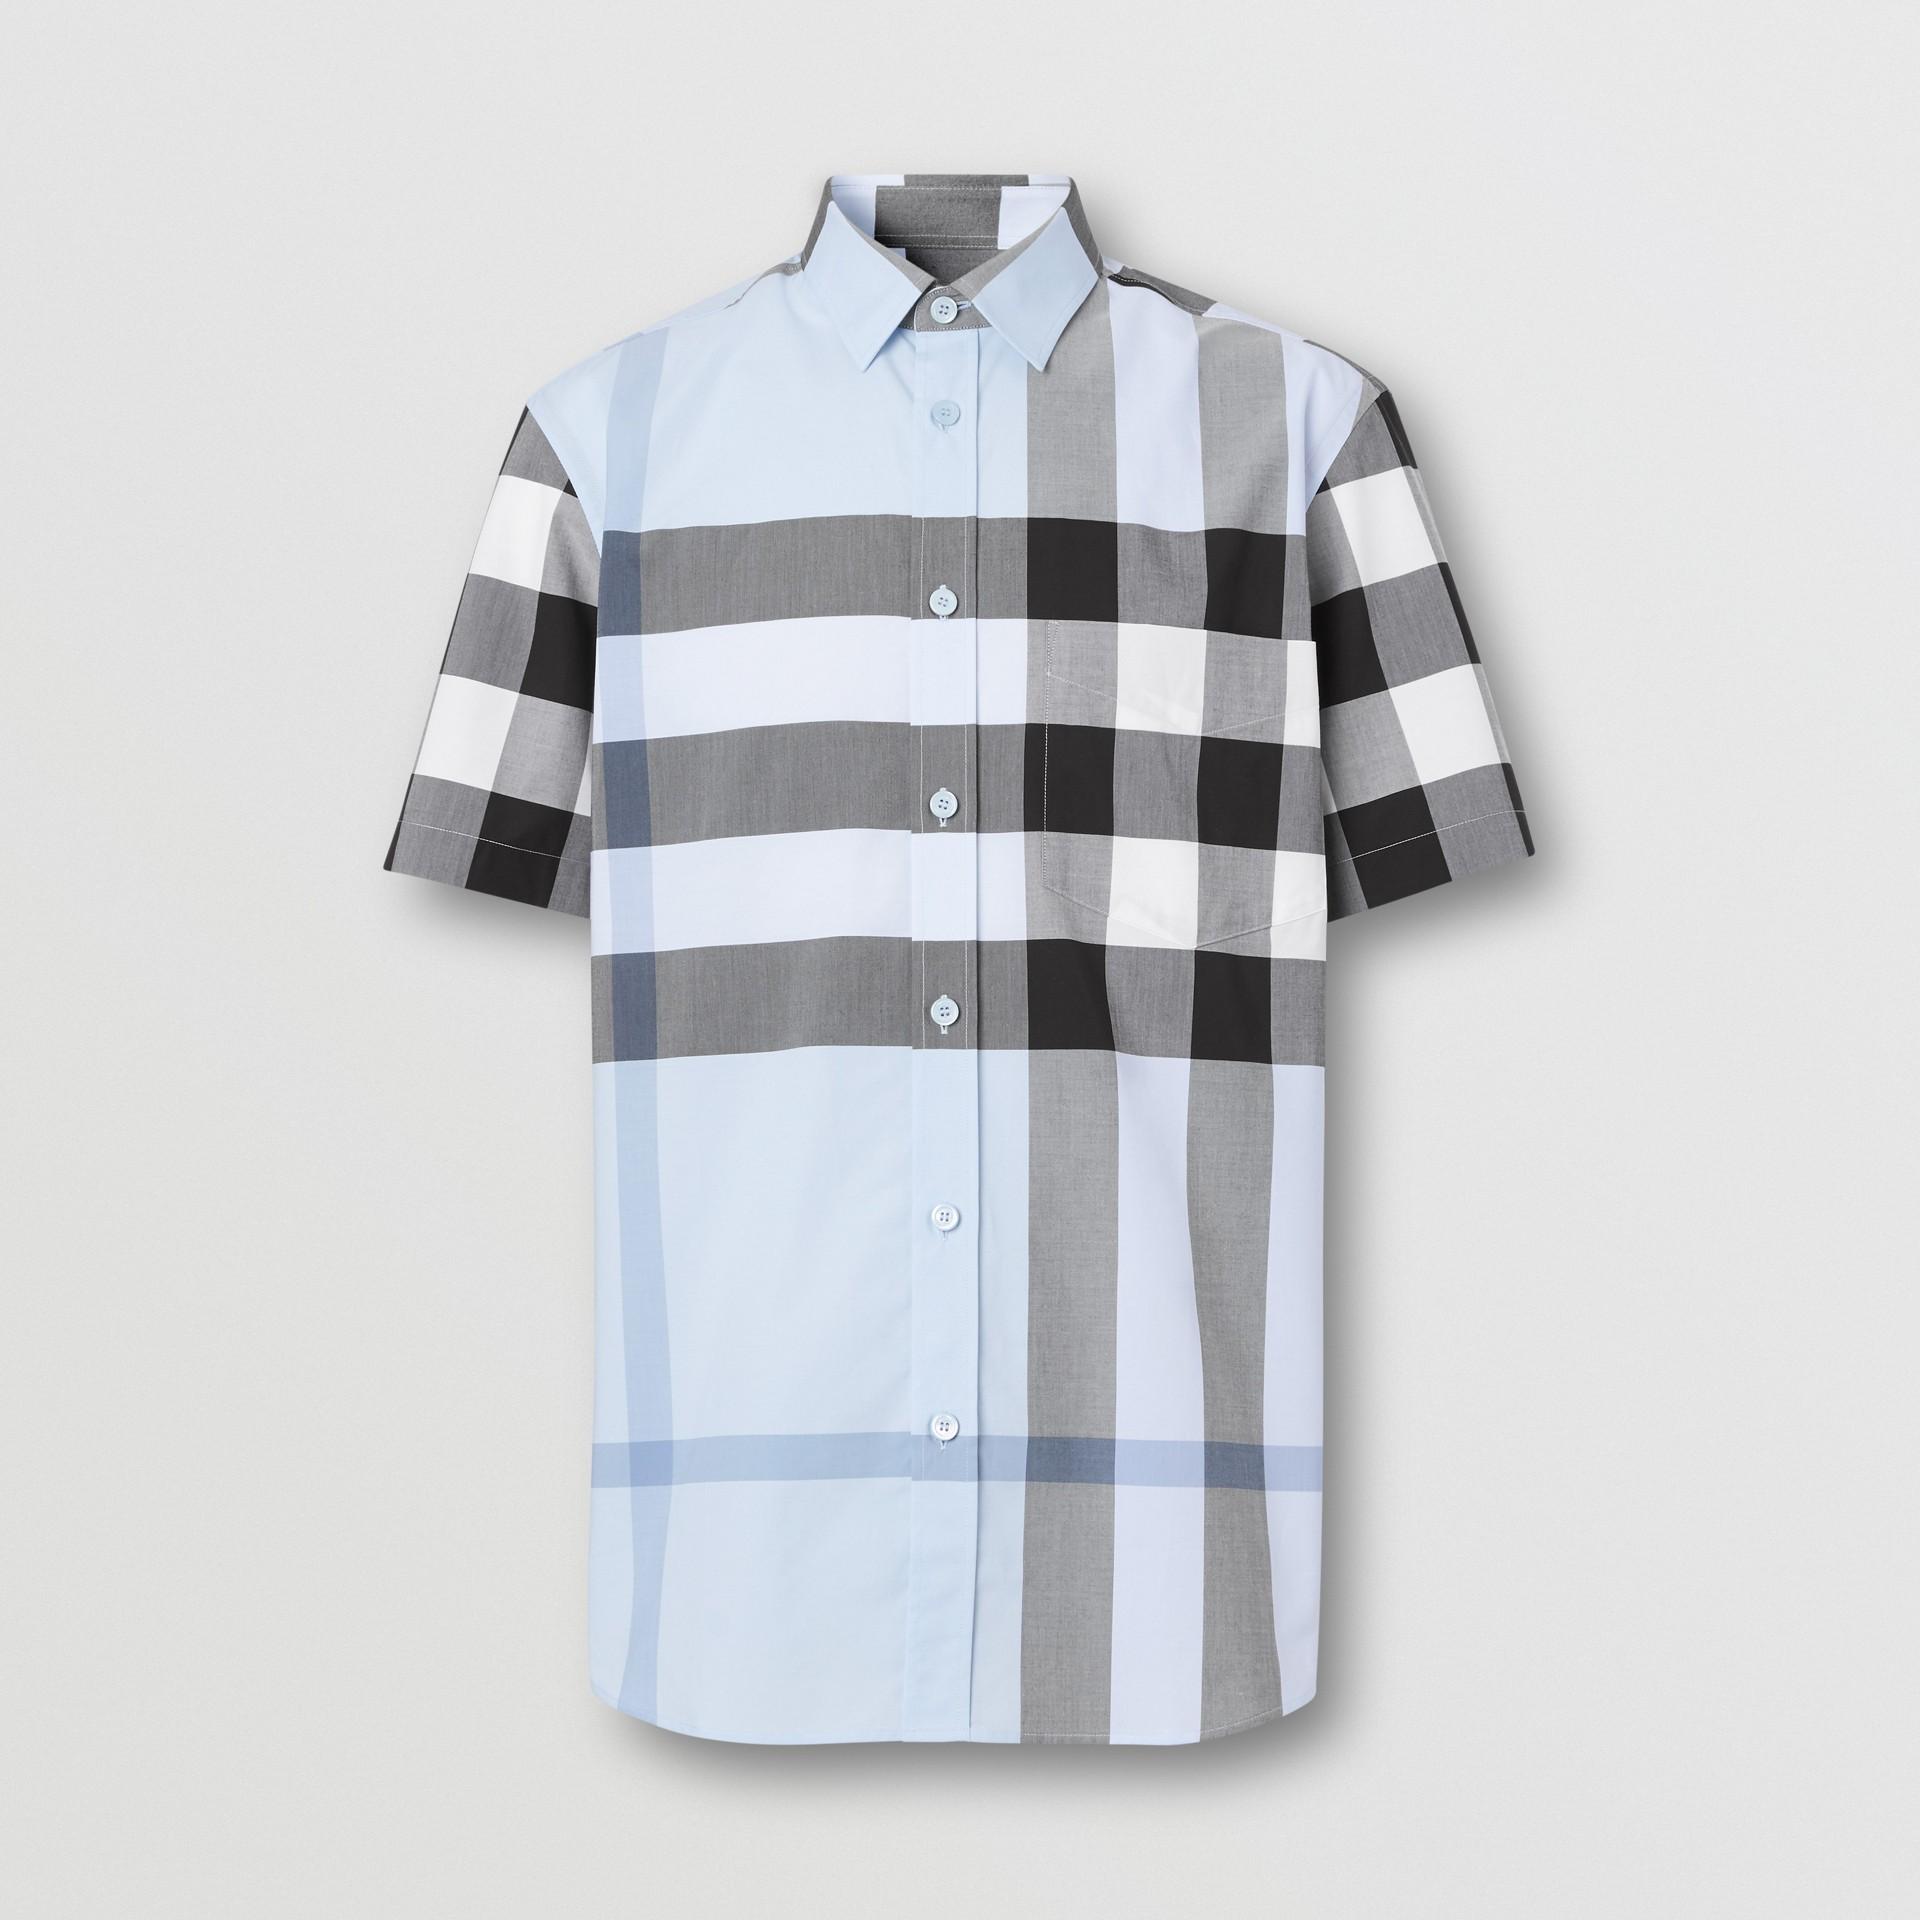 Short-sleeve Check Stretch Cotton Poplin Shirt in Chalk Blue - Men | Burberry Hong Kong S.A.R - gallery image 3